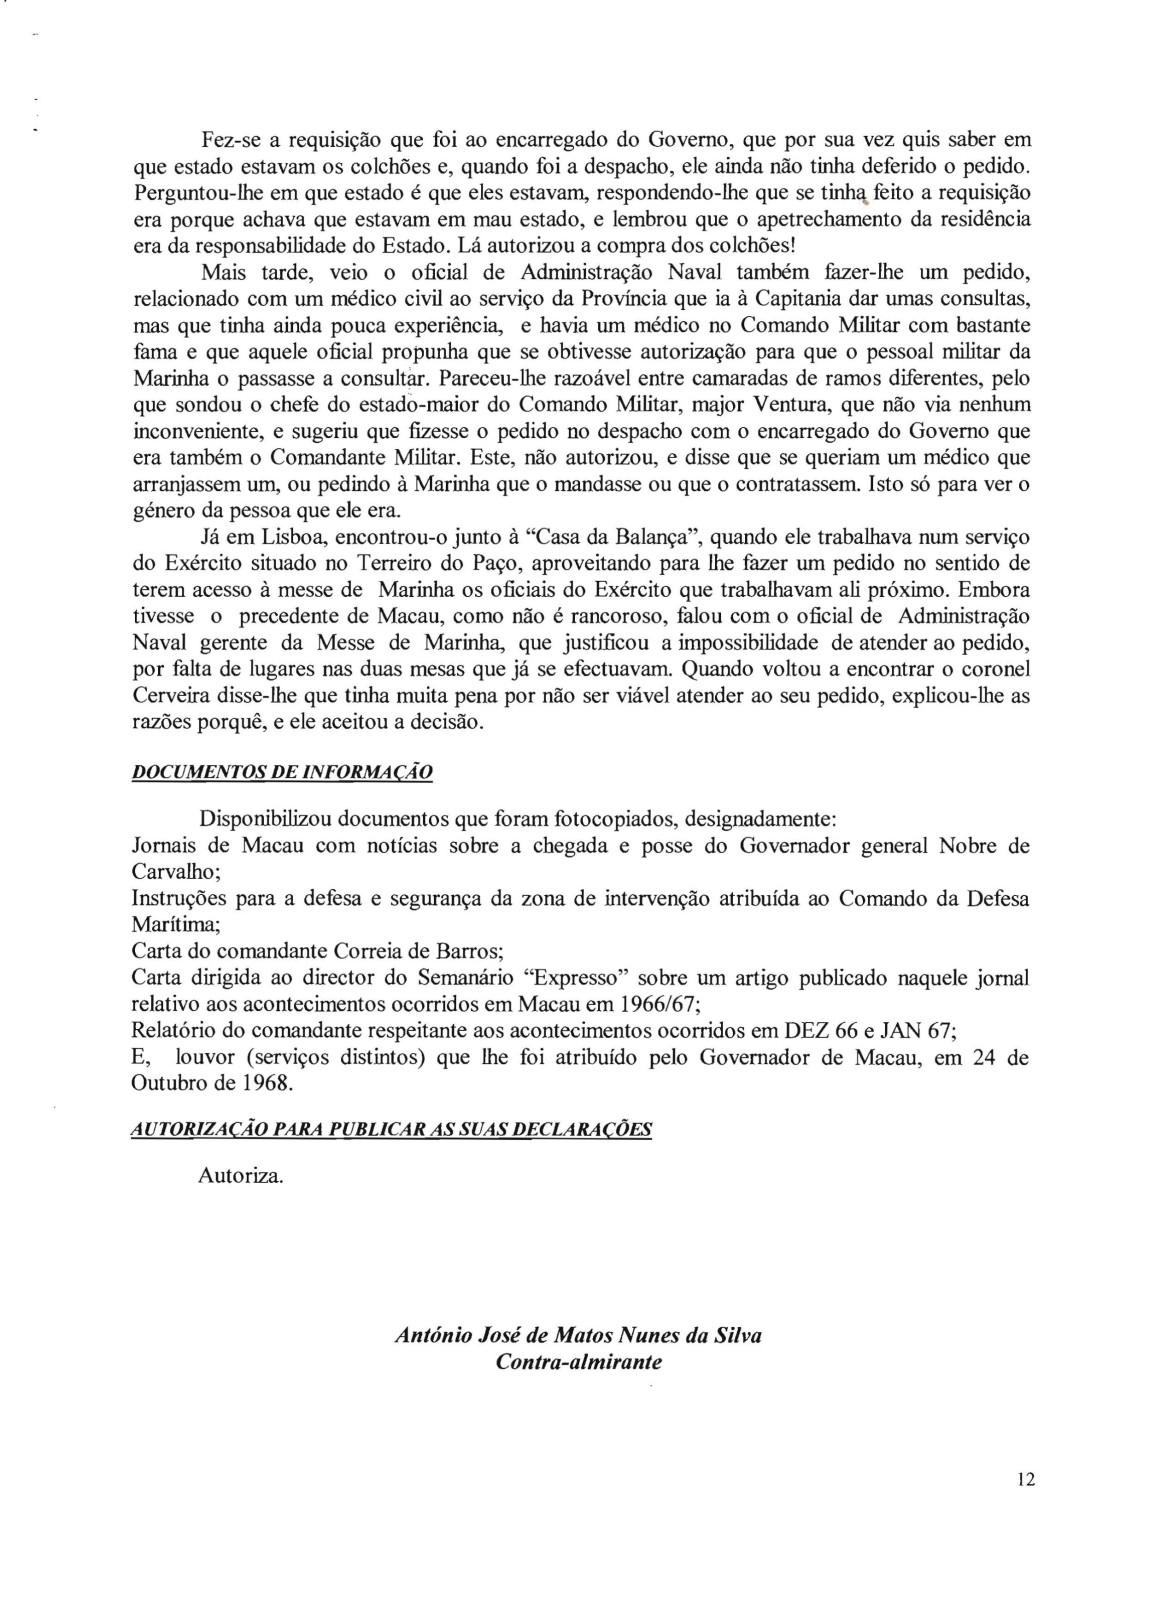 00477 01-03-28 Academia de Marinha-Entrevista do Alm Nunes da Silva pg 12 de 12